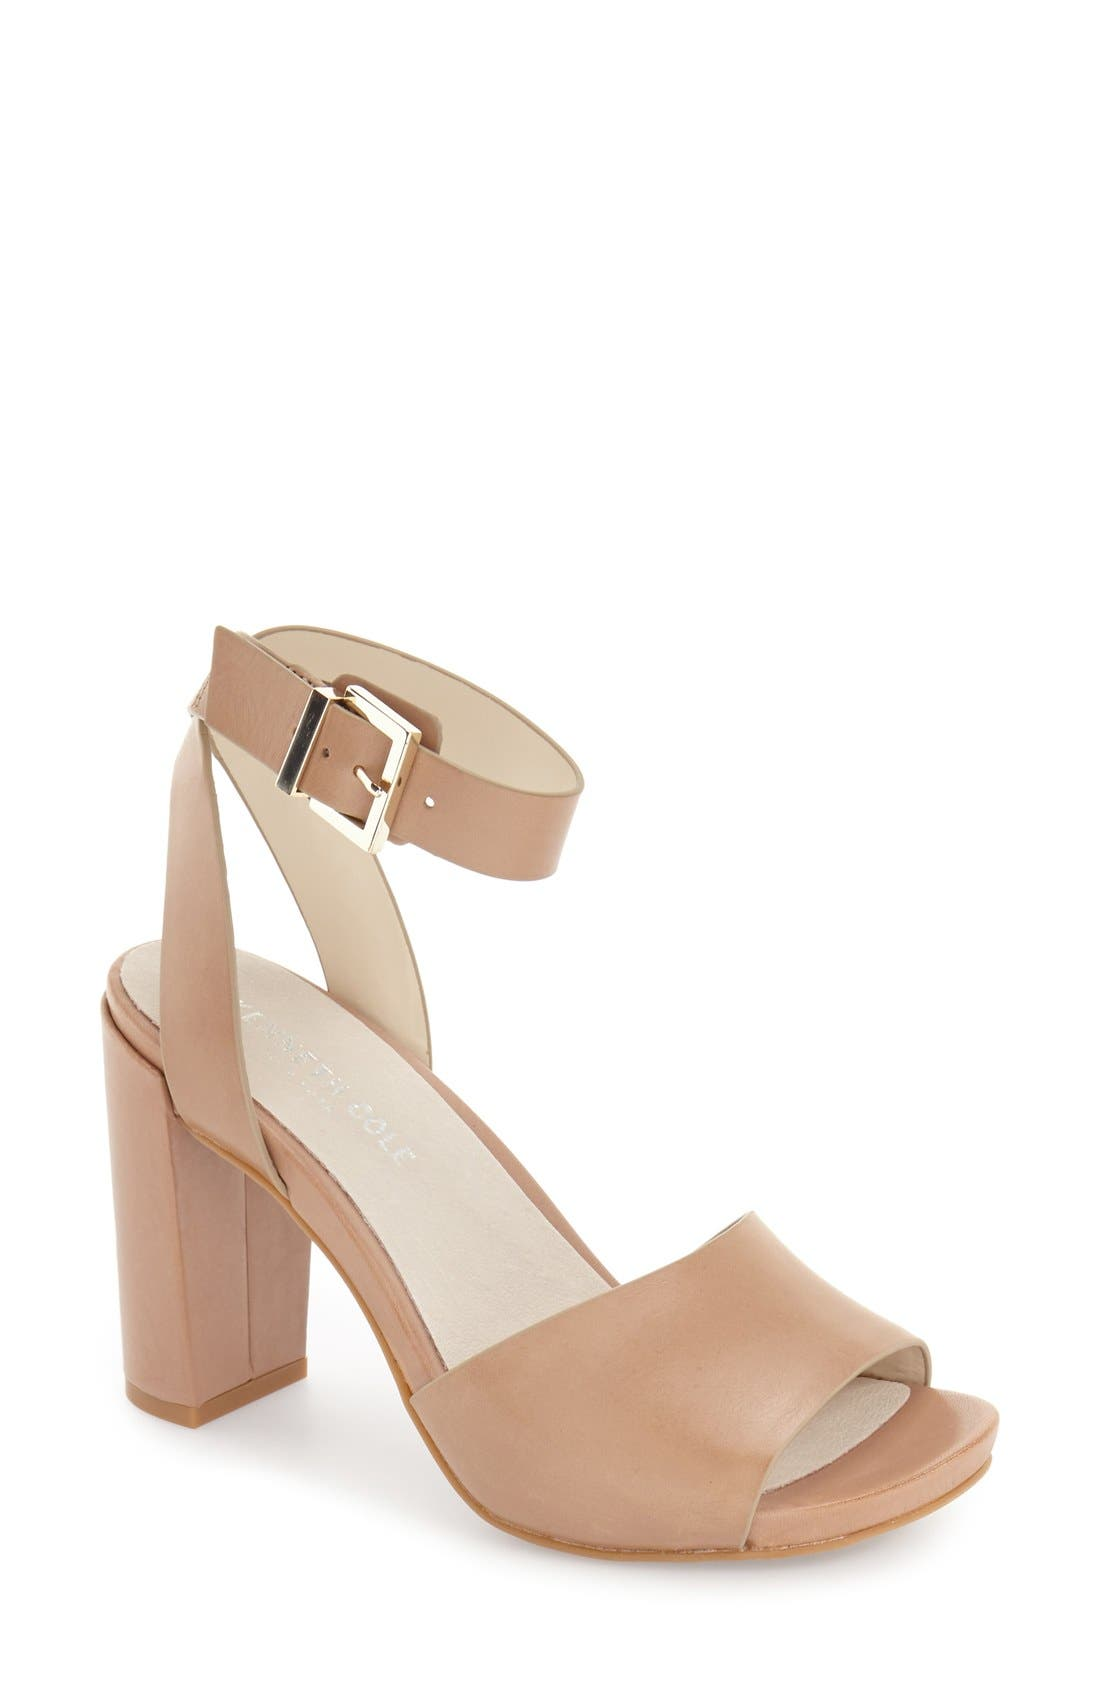 Kenneth Cole New York 'Toren' Block Heel Sandal (Women)